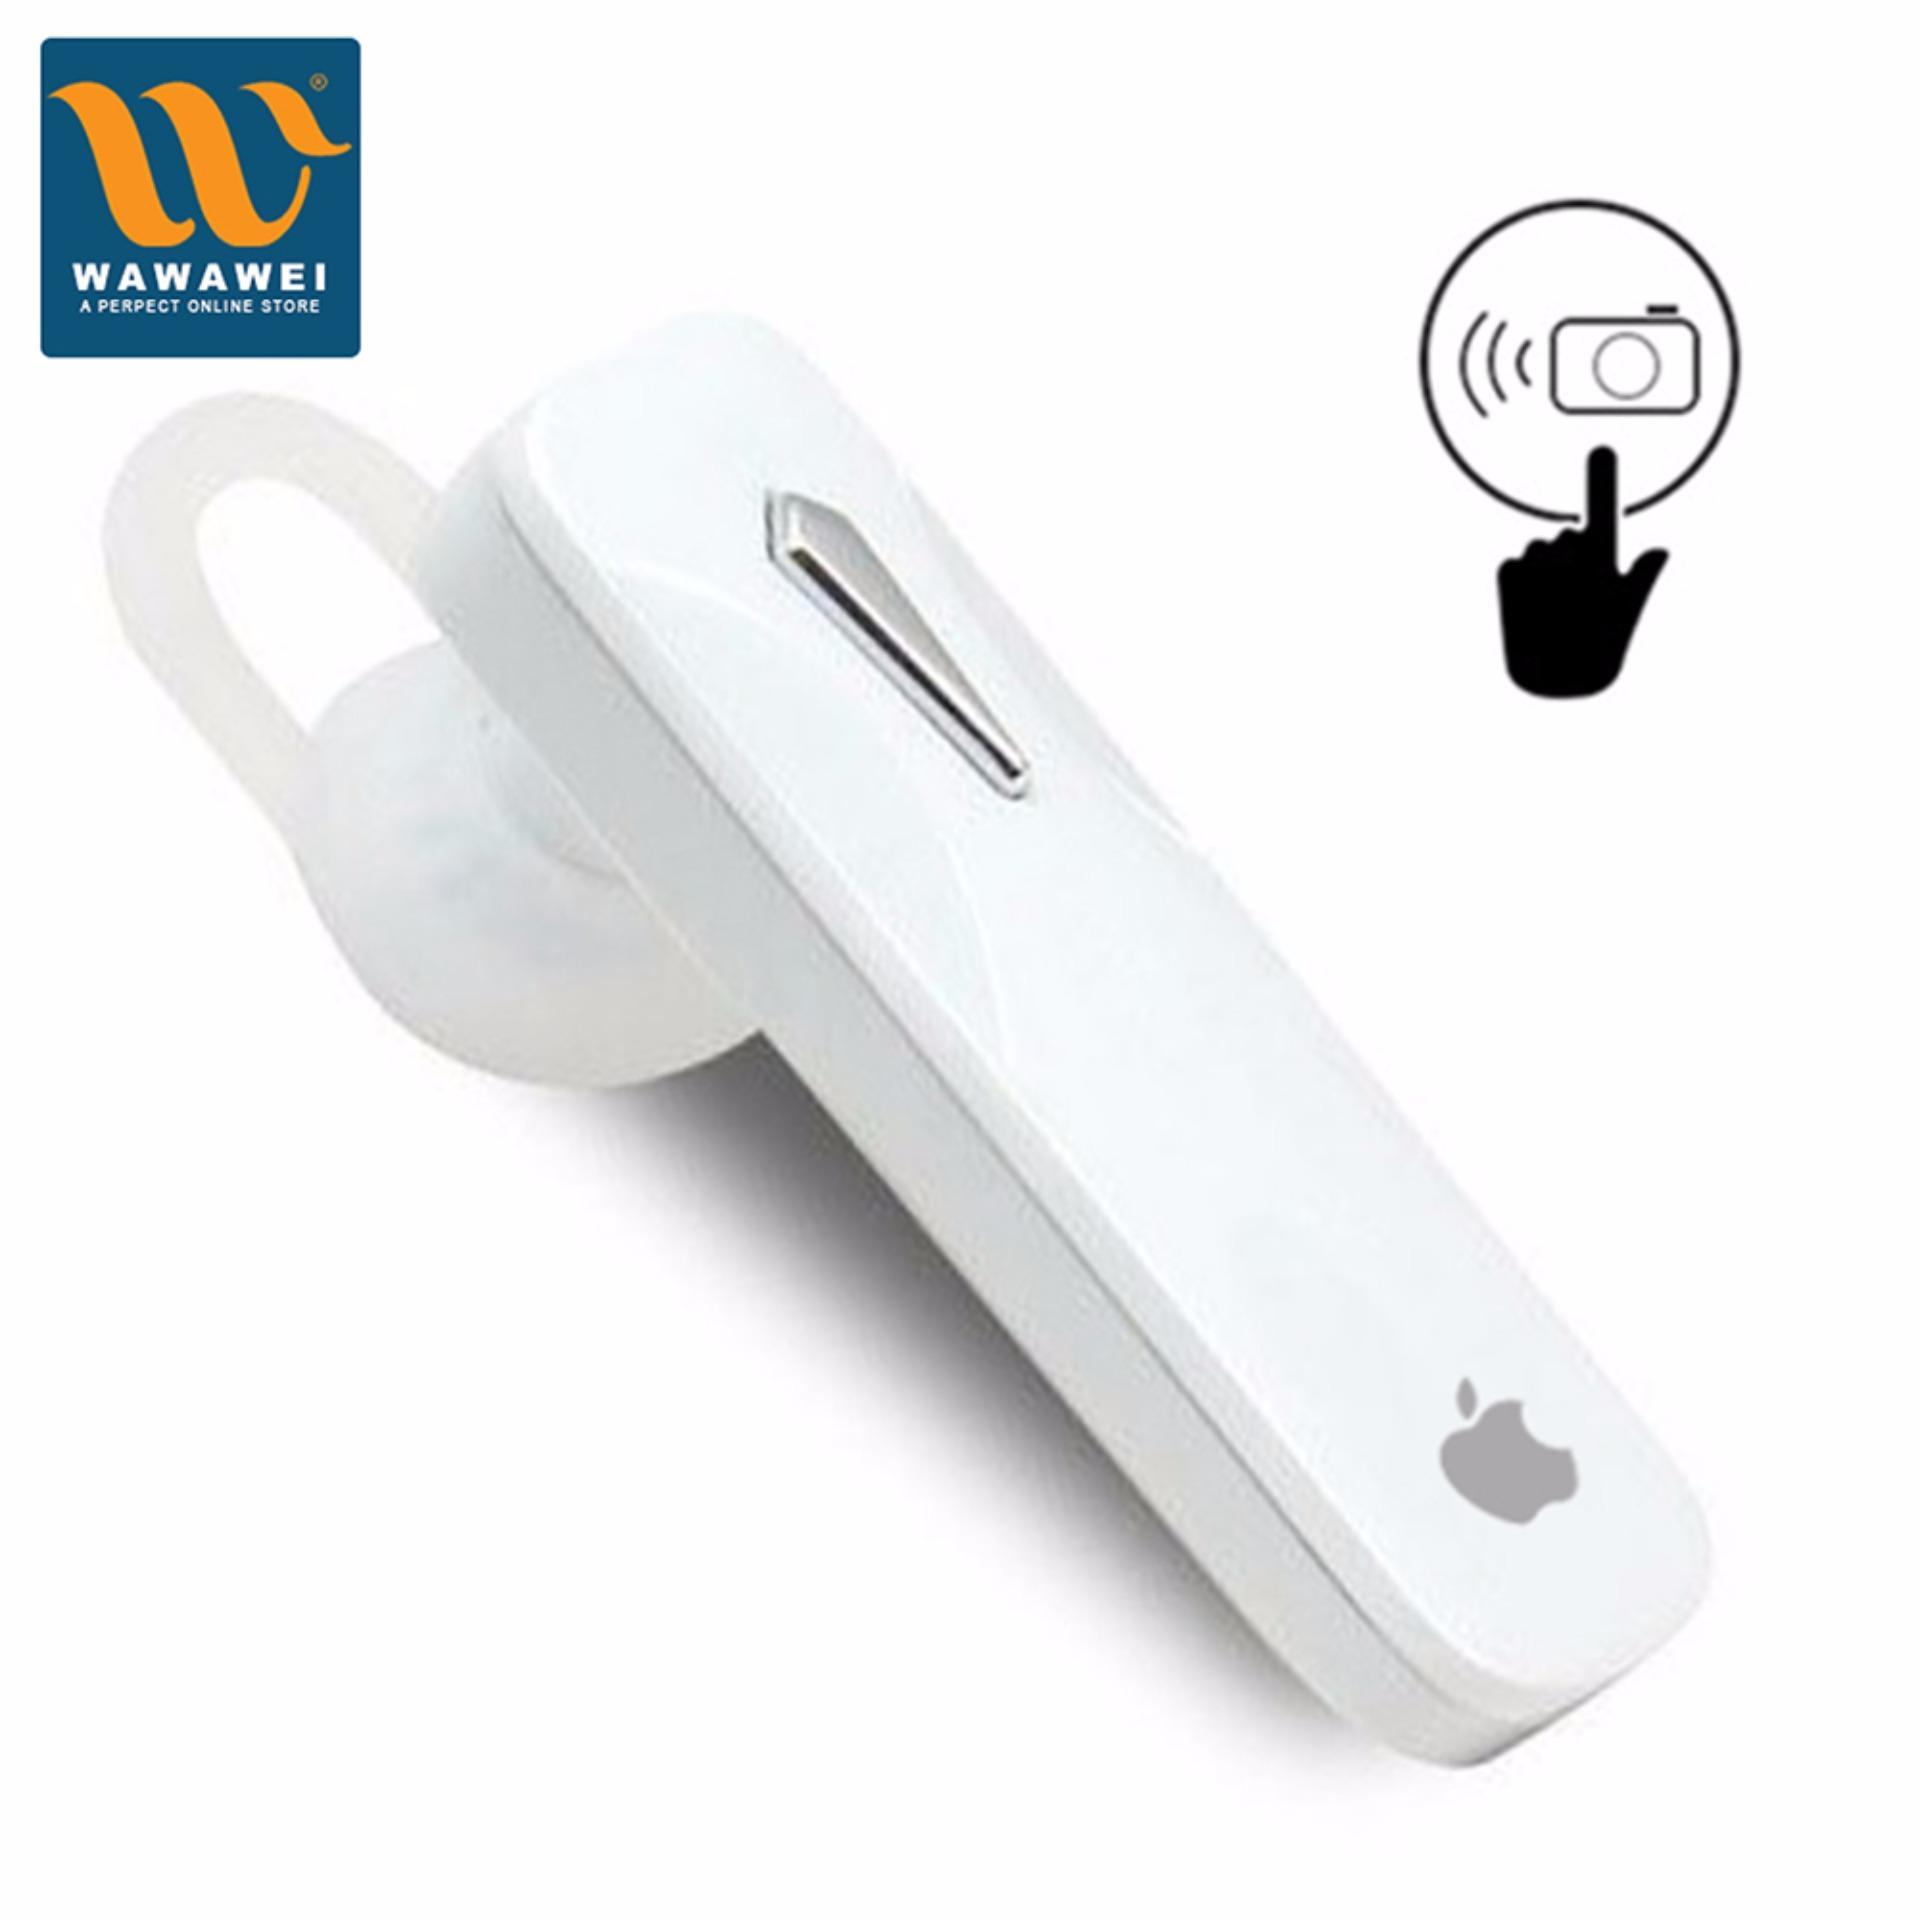 Apple Bluetooth Headset Wireless Earphones Portable HandsfreeStereo Headphones with Microphone Universal for iPhone .